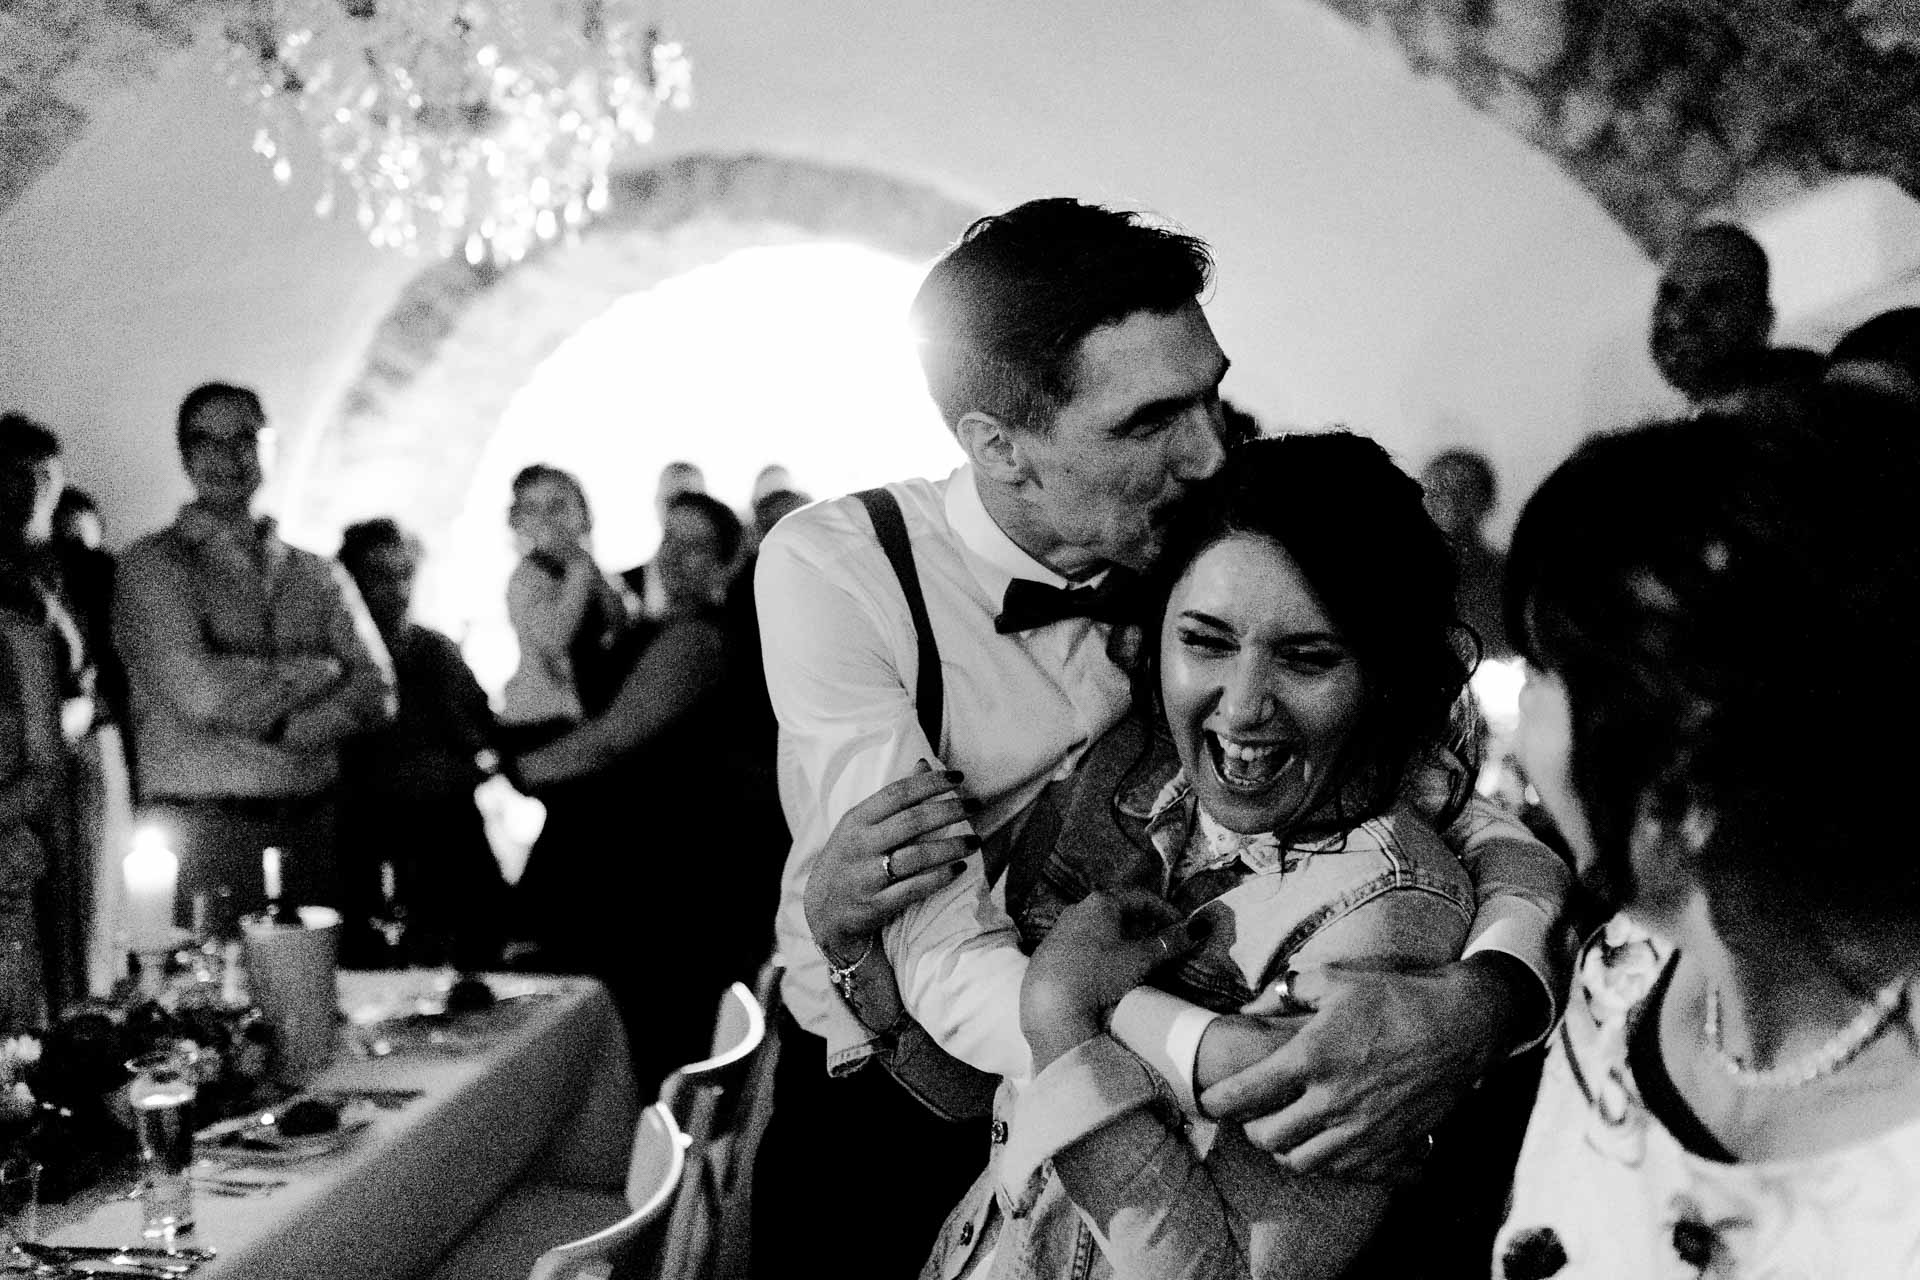 Himmelblau Rust Boho-Hochzeit Burgenland heiraten Boho First Dance